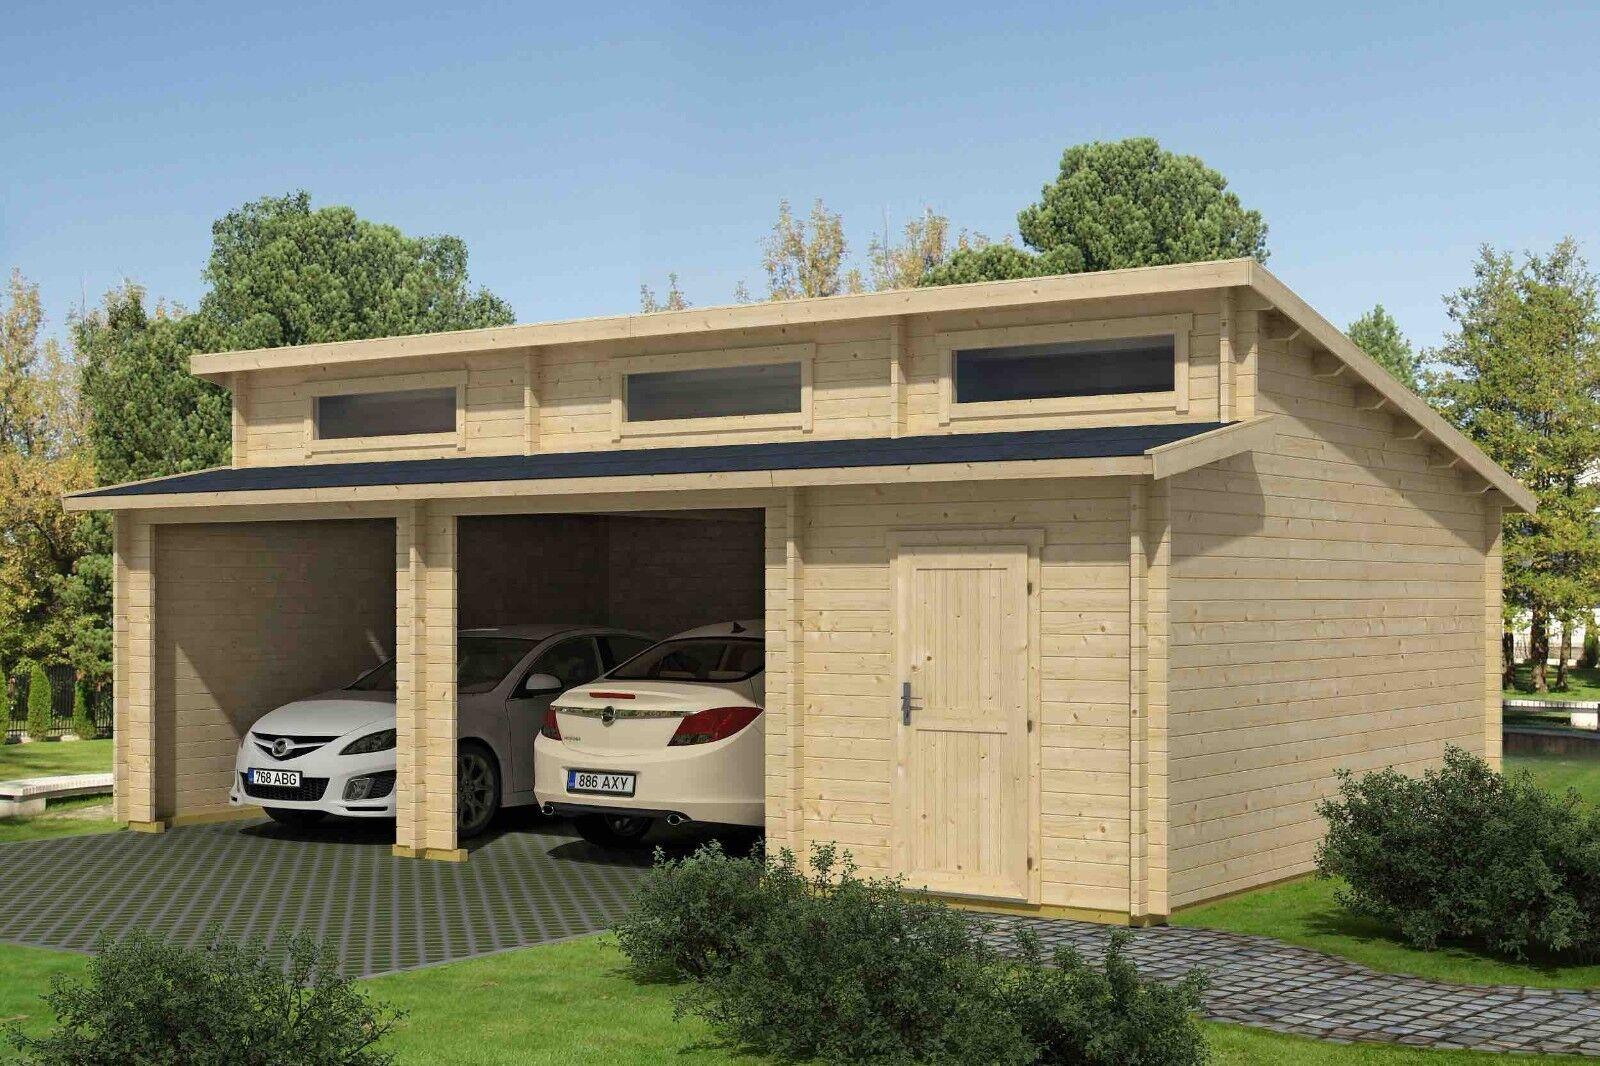 Holzgarage Satteldach Fertiggarage Carport Gartenhaus